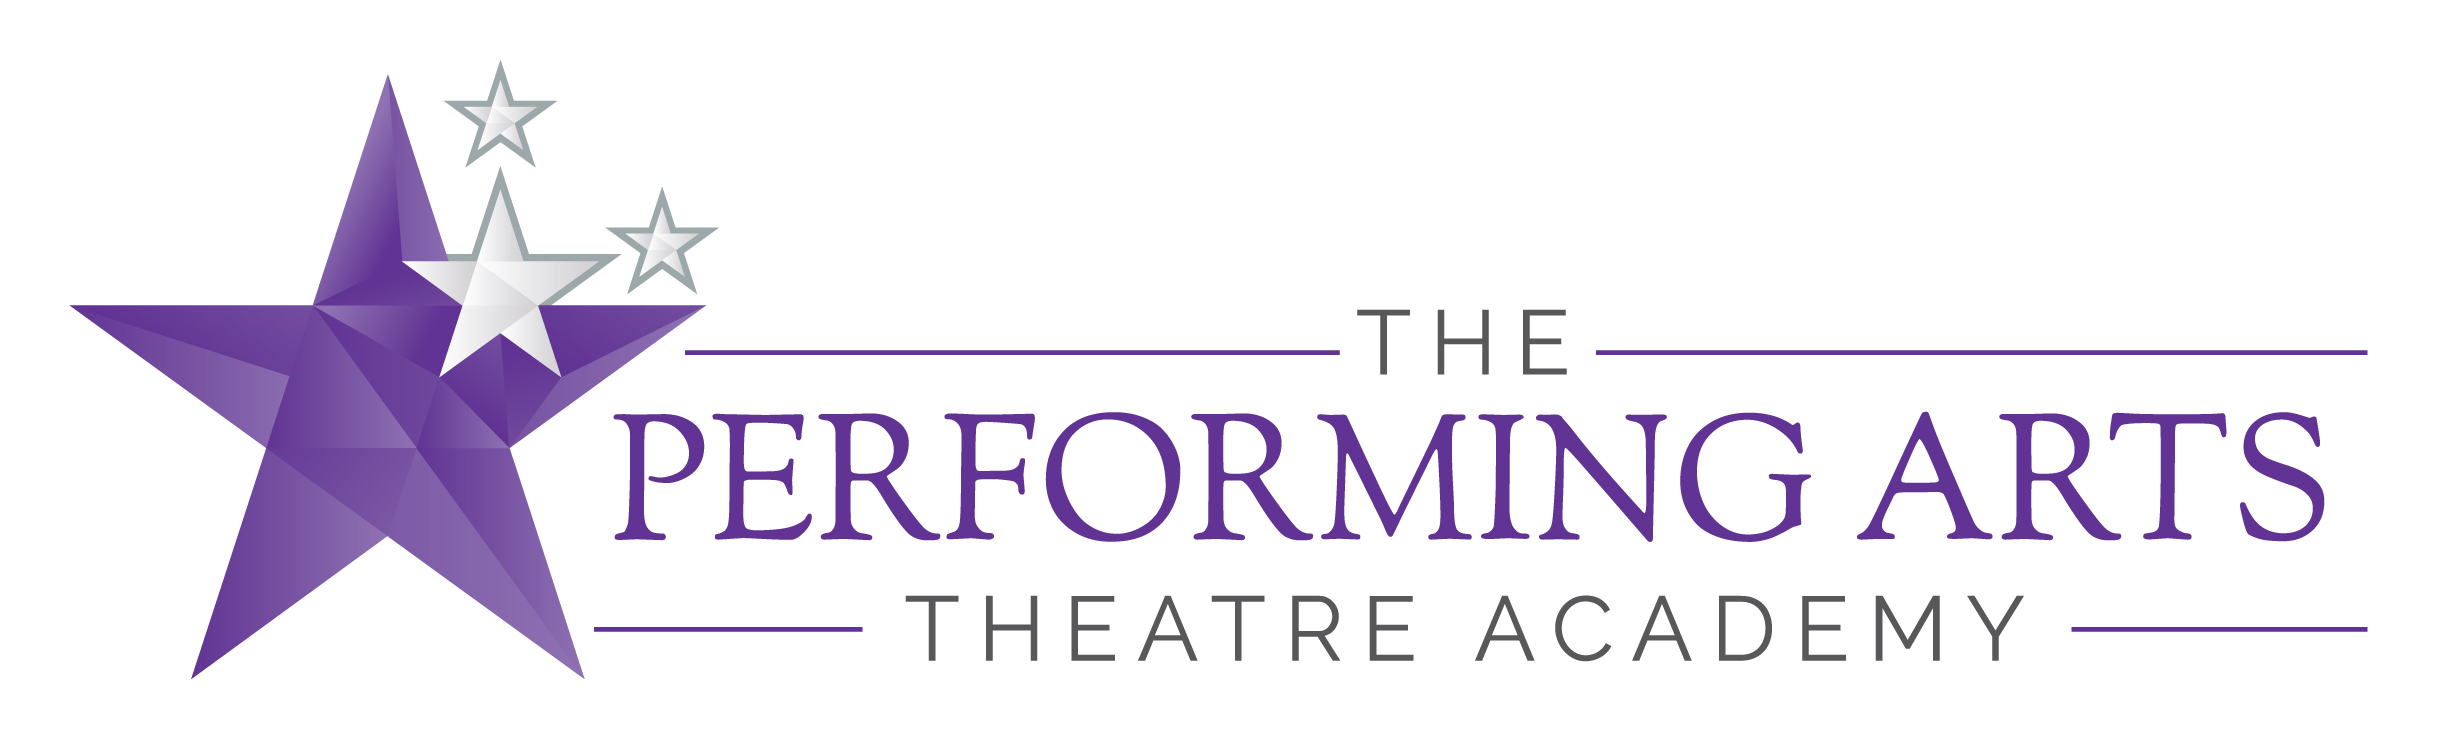 Performing Arts Logo 2.jpg